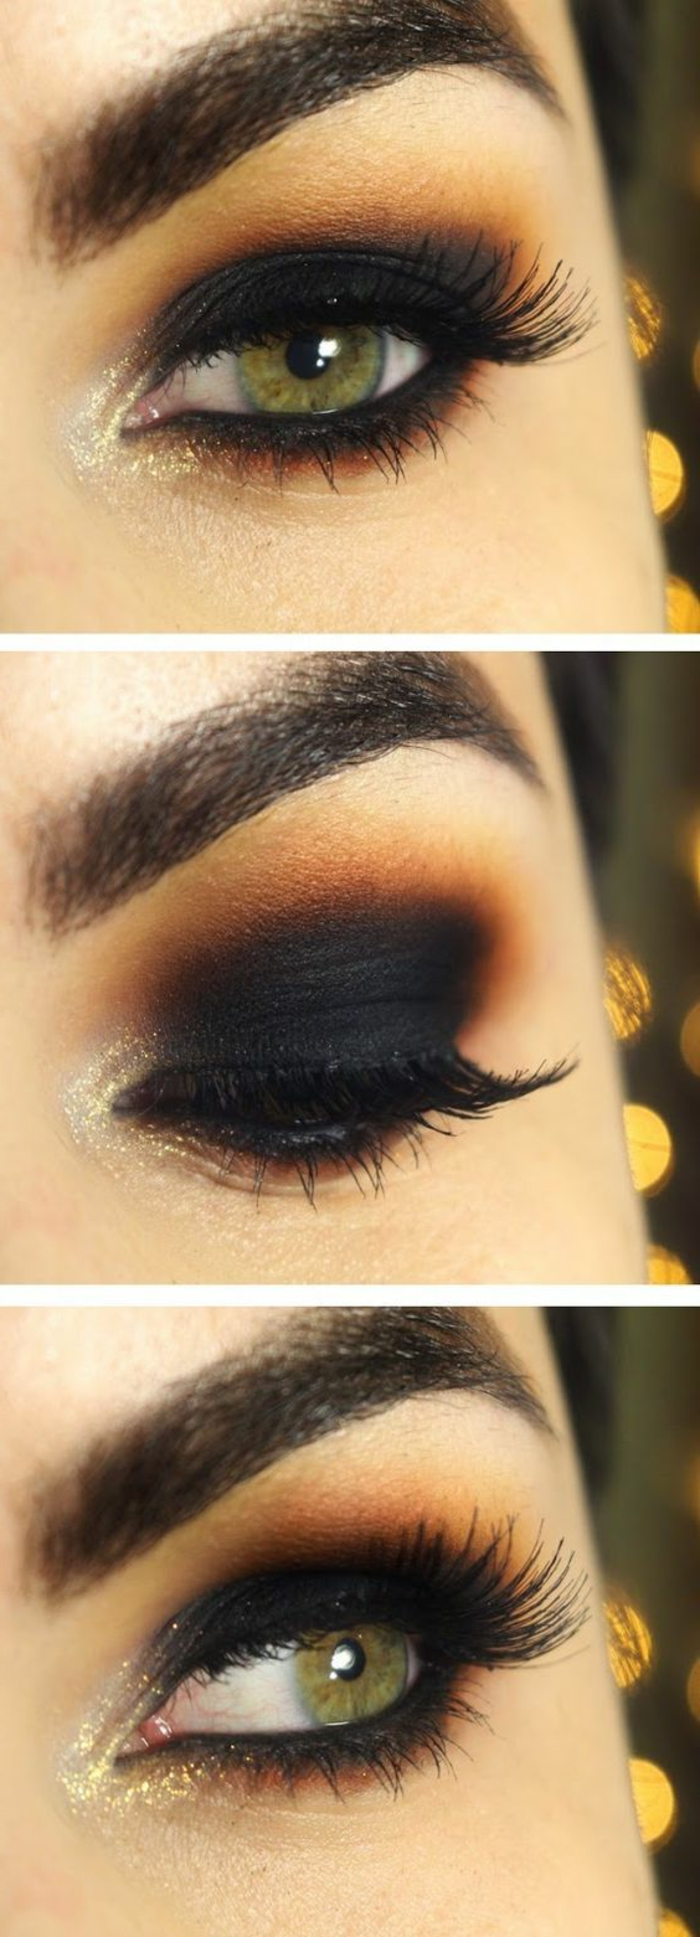 como-pintarse-los-ojos-tonos-oscuros-negro-marrón-oro-ojos-verdes